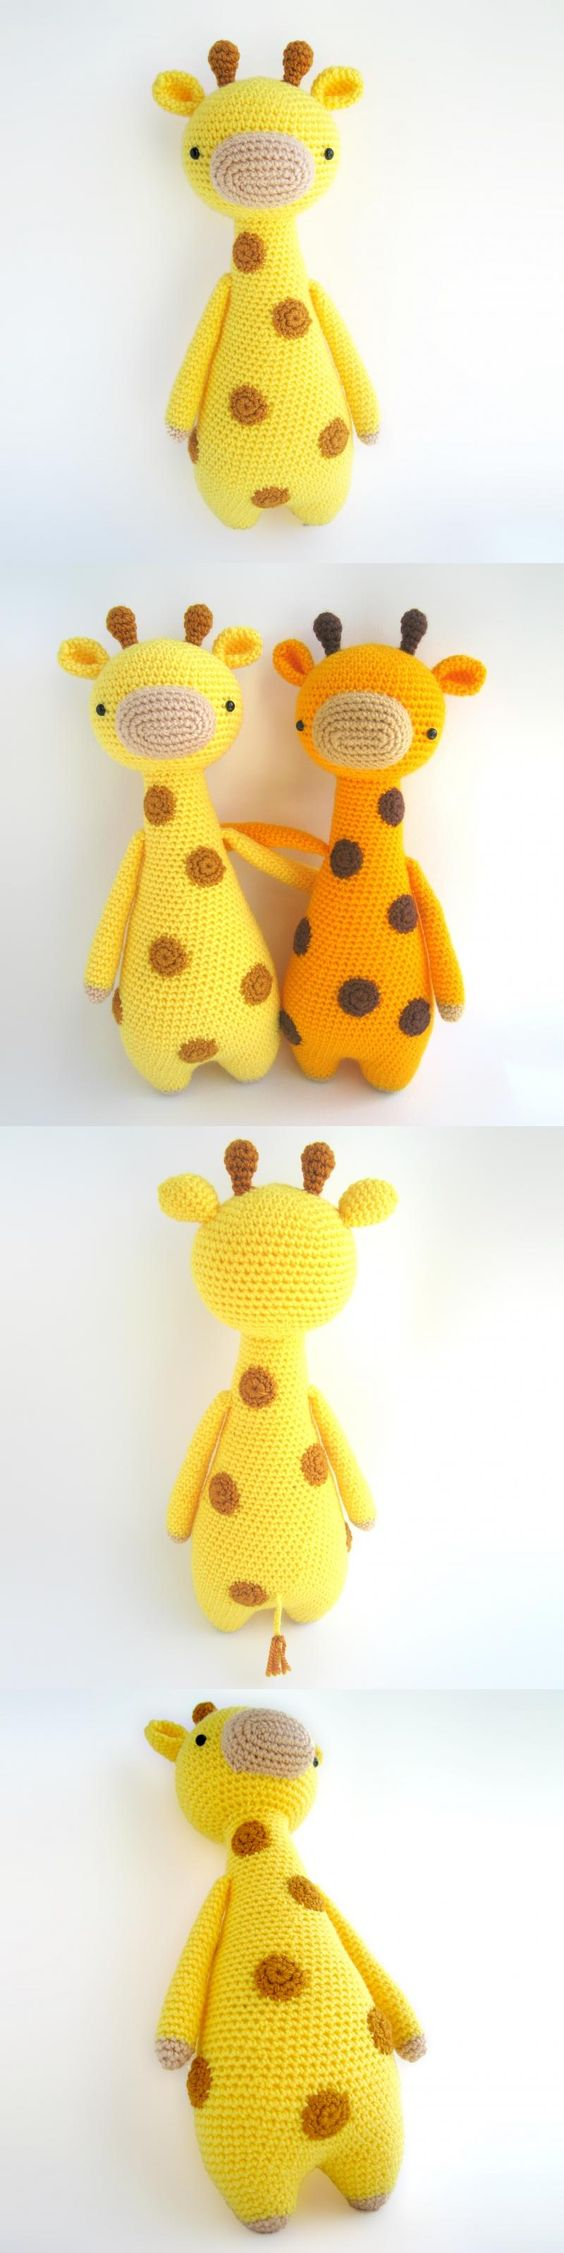 jirafa-crochet-otakulandia.es (2)